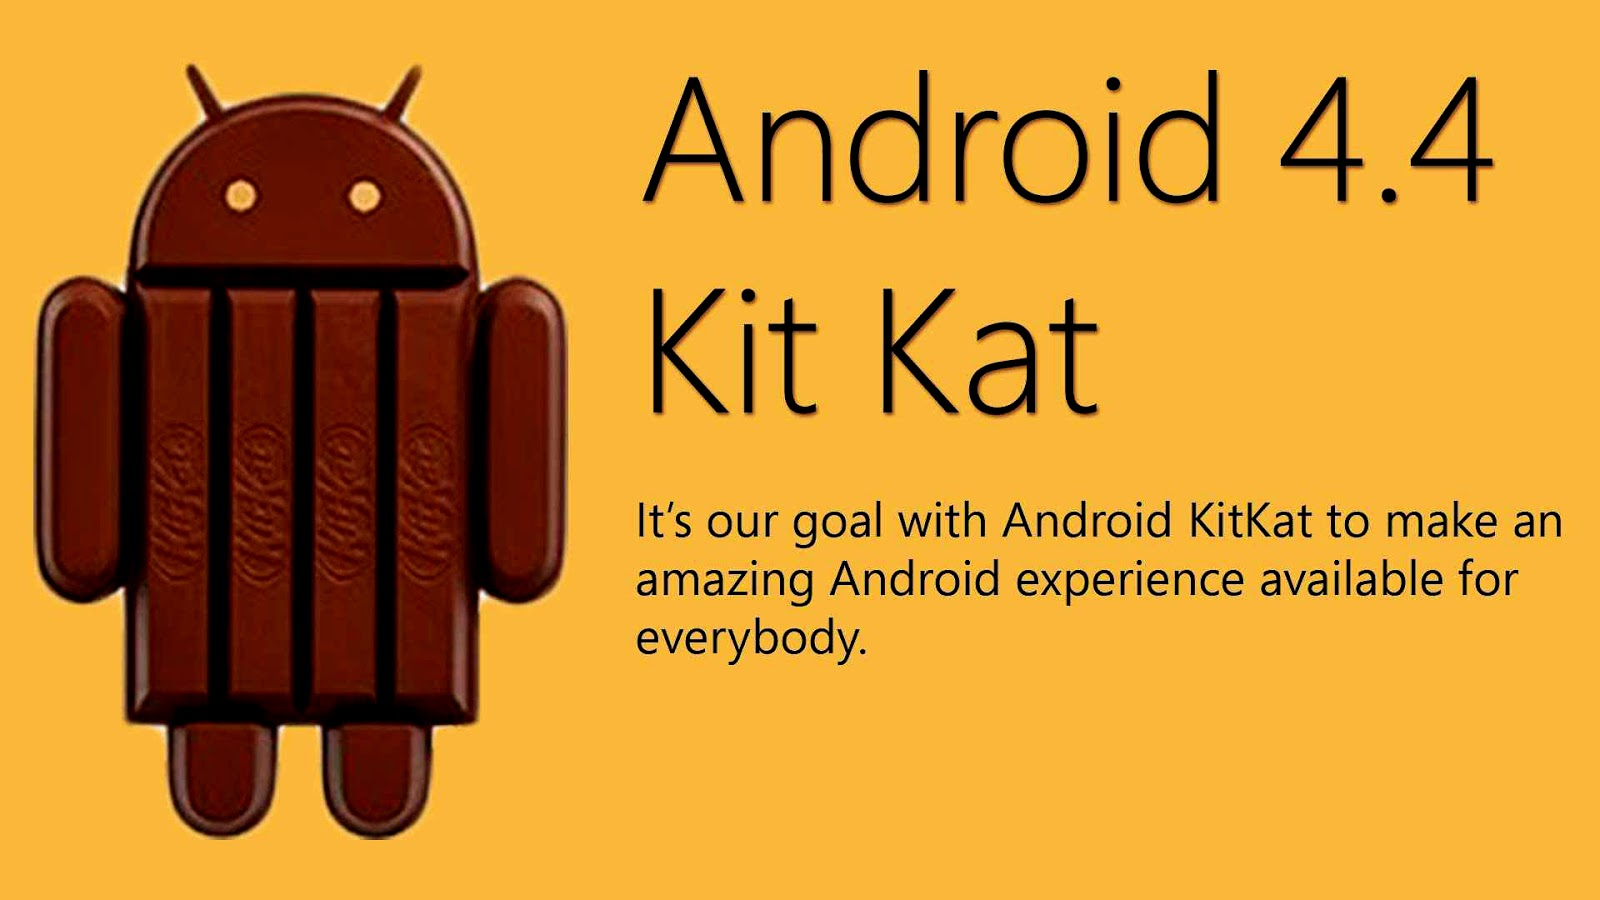 Android kitkat   - 4.4.1 - 4.4.2 - 4.4.3 - 4.4.4 ...